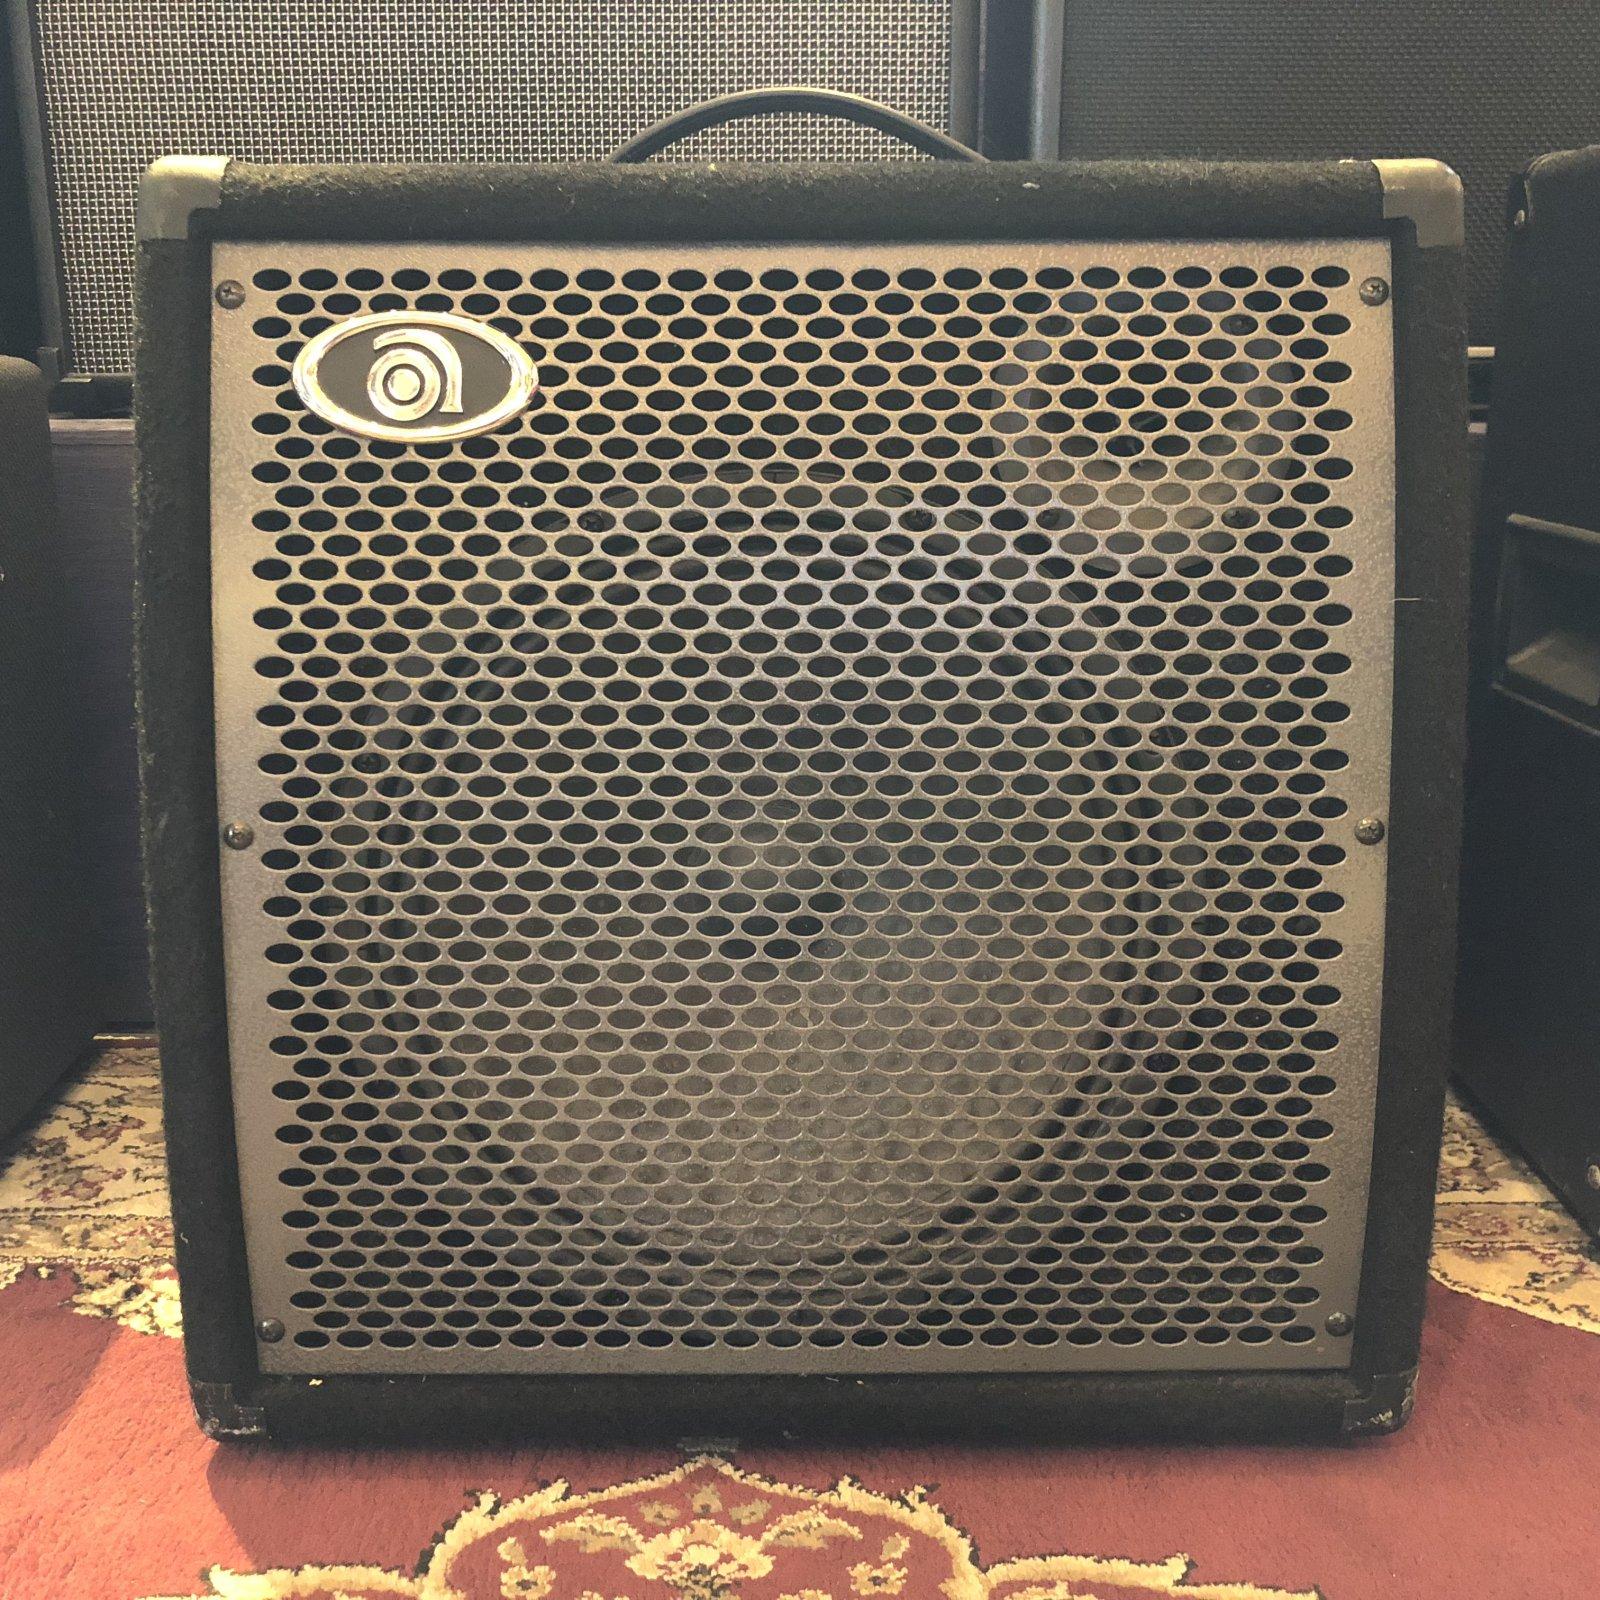 Used Ampeg PB-12 PortaBass 1x12 Cabinet